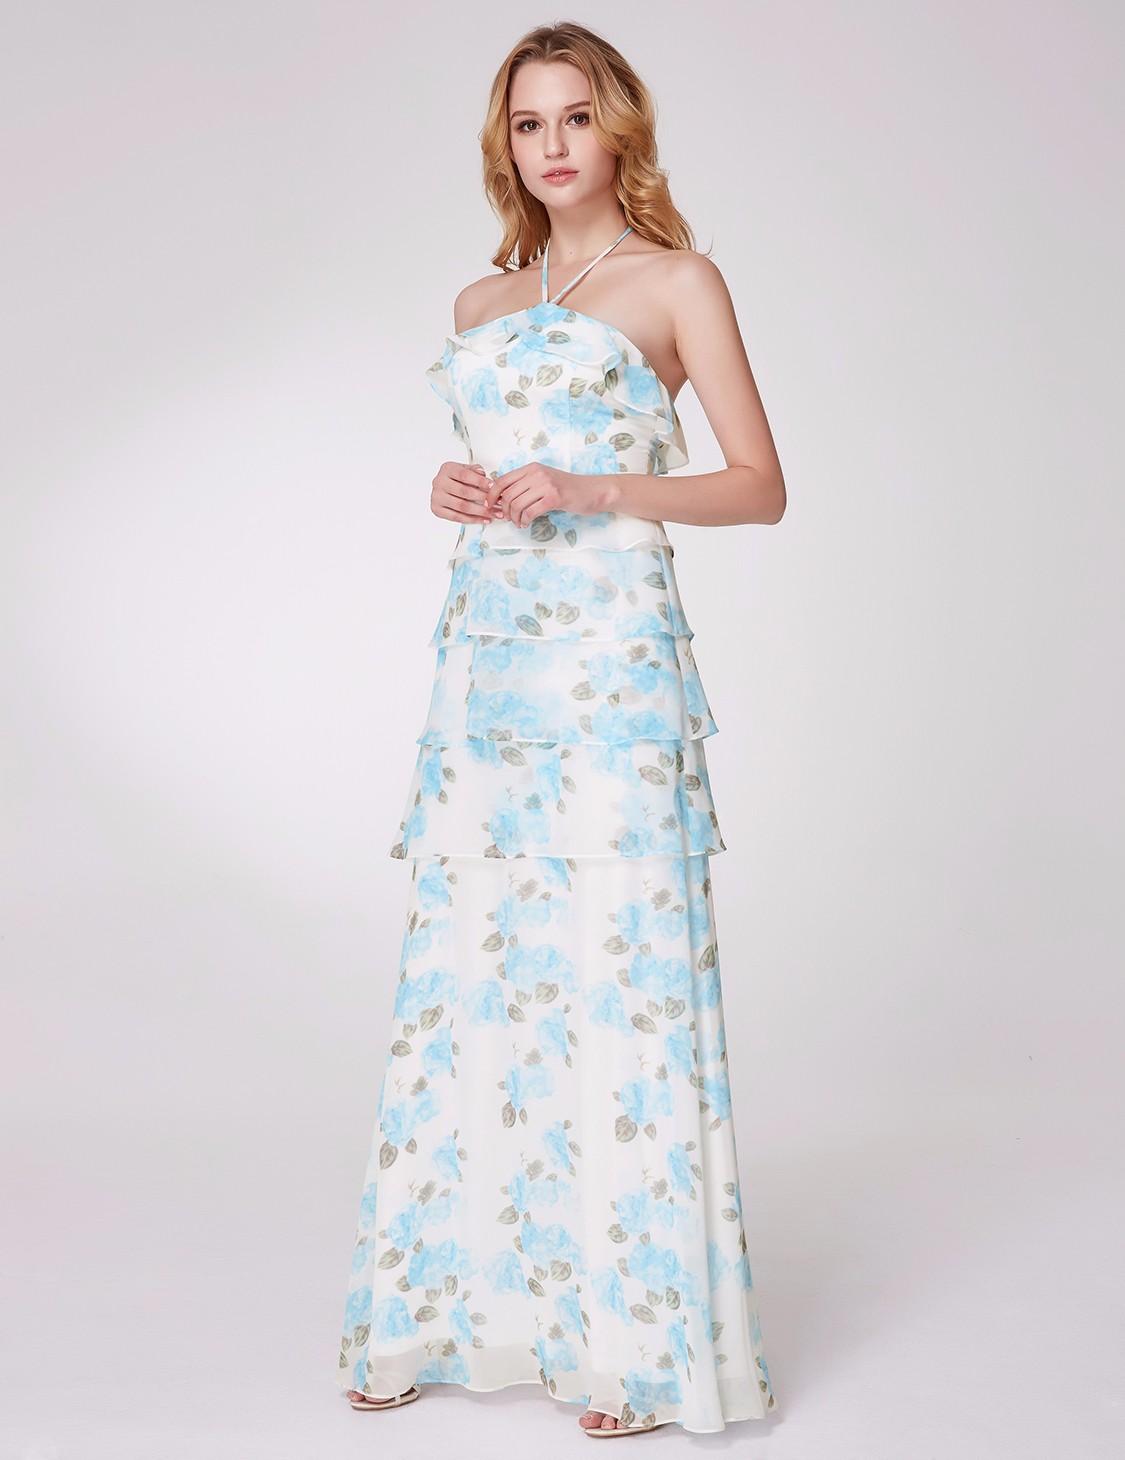 Ever-Pretty-Floral-Formal-Wedding-Bridesmaid-Dresses-Long-Prom-Dresses-07239